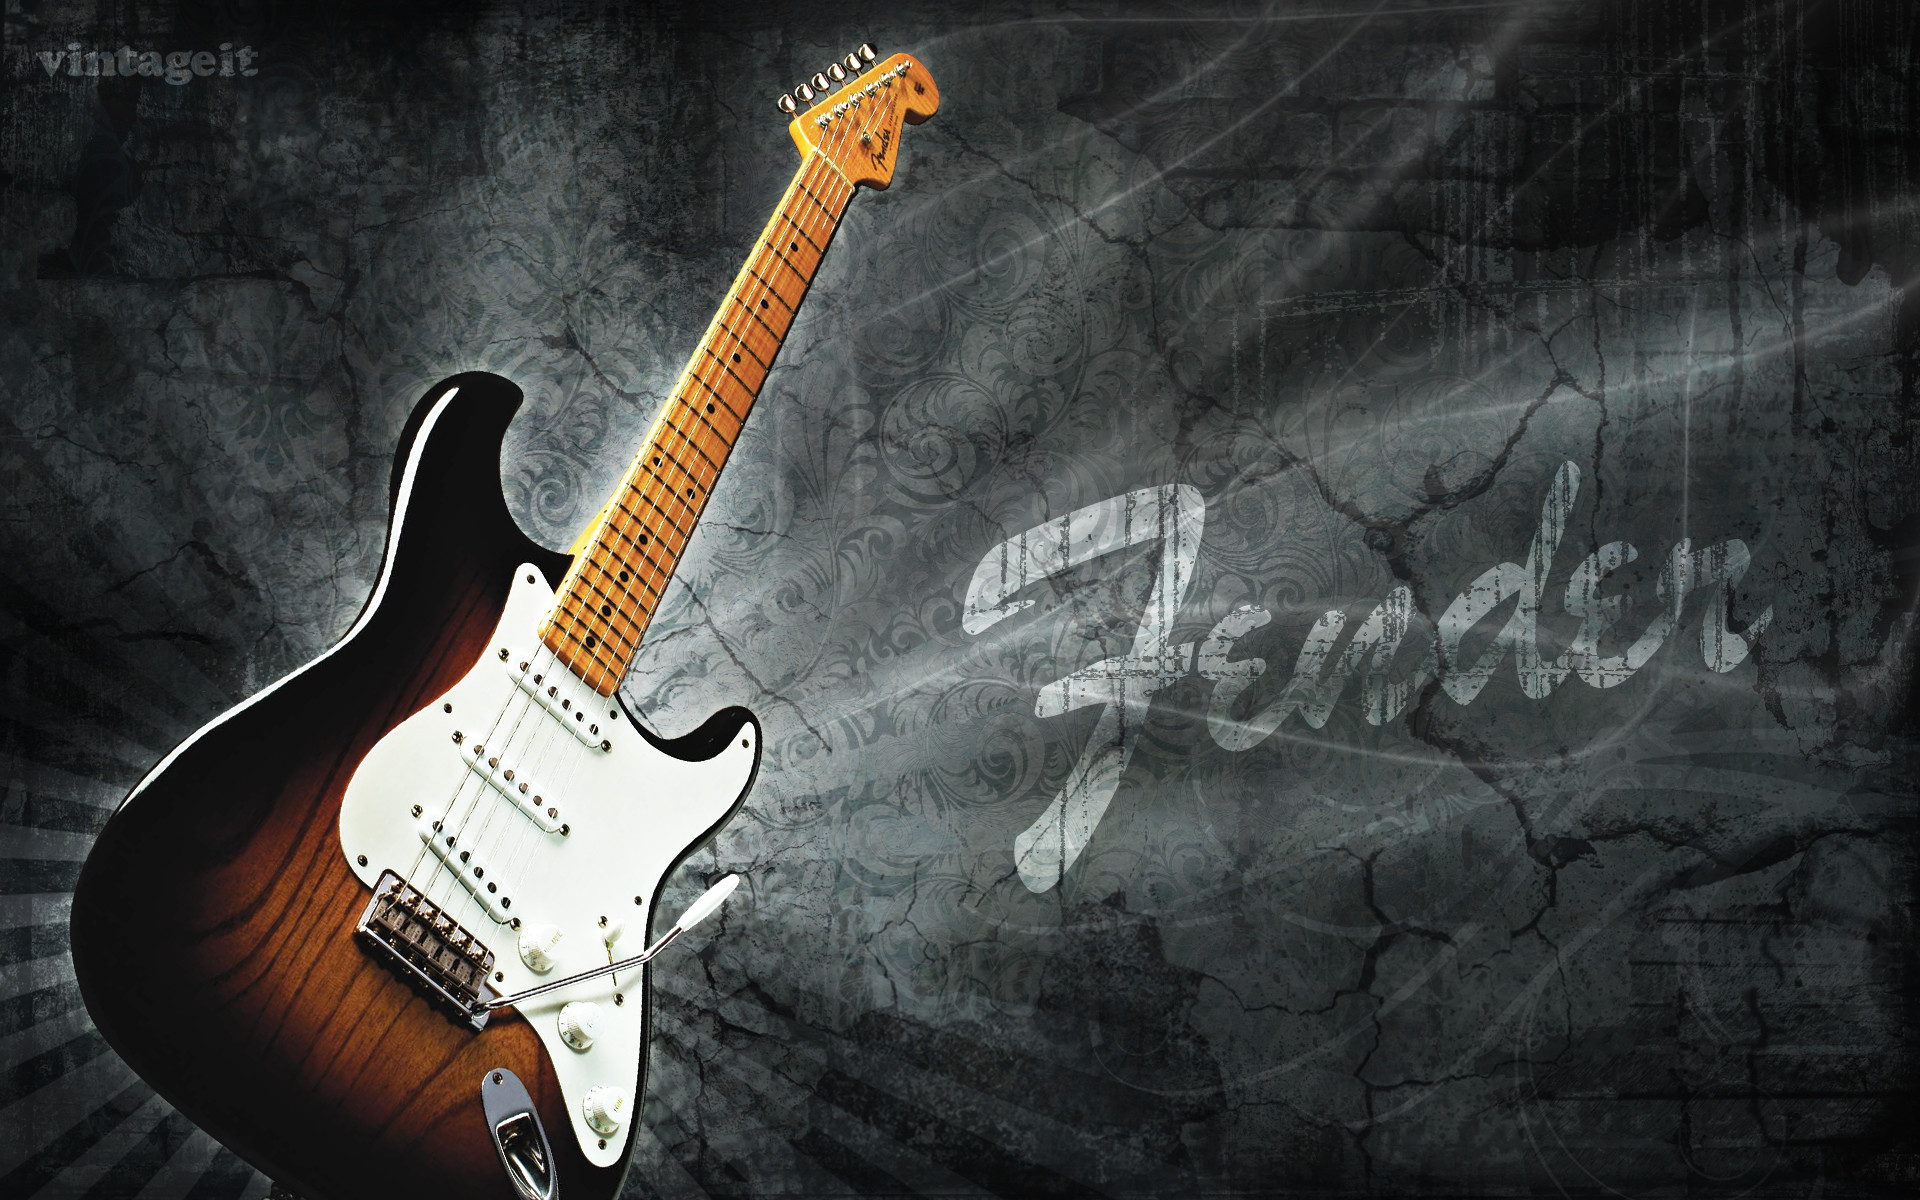 Fender Stratocaster wallpaper – Free Desktop HD iPad iPhone wallpapers